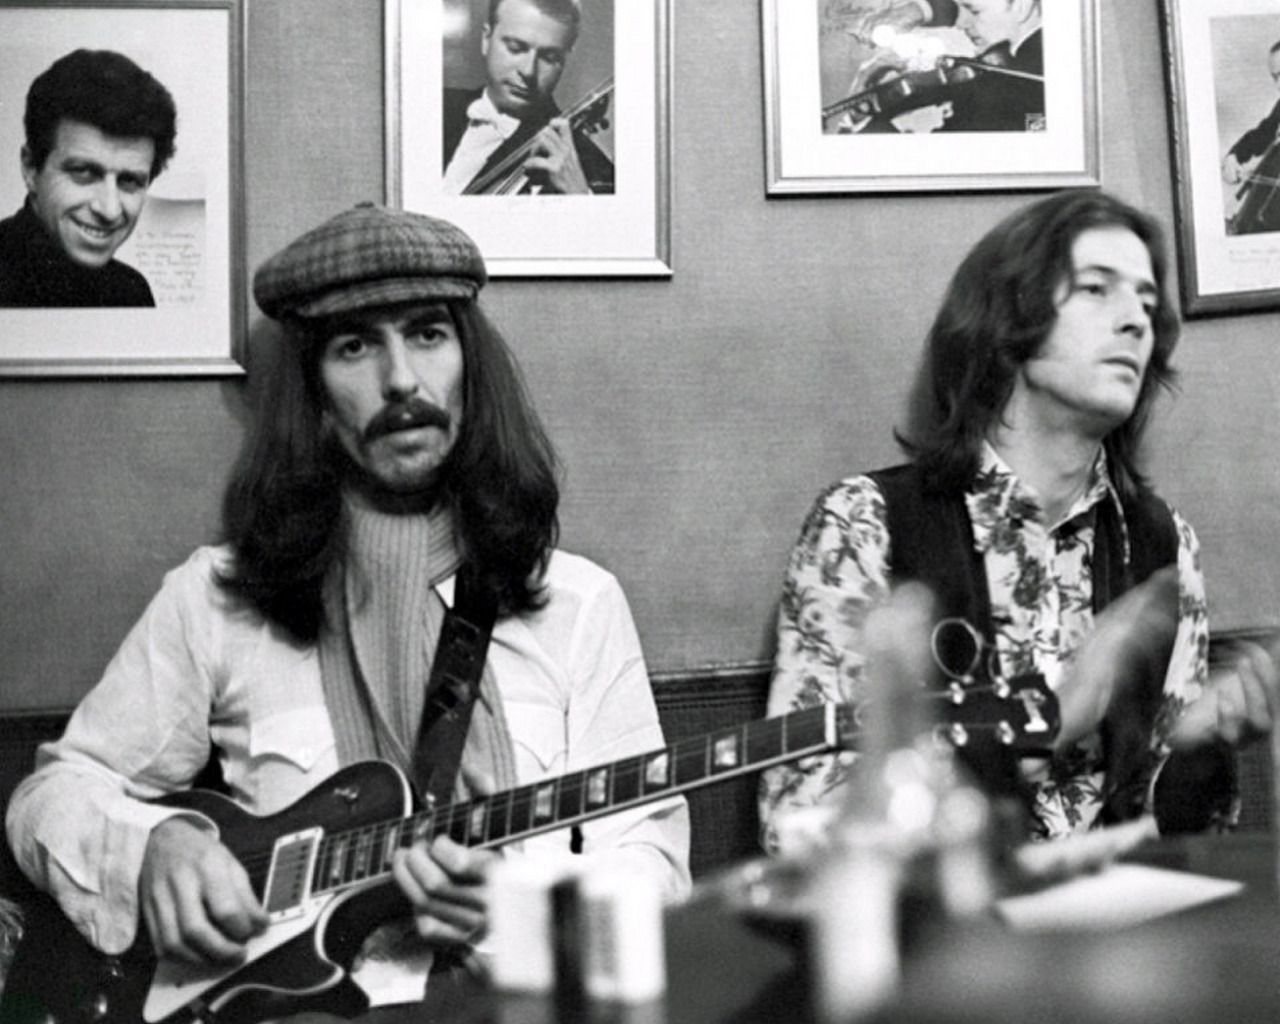 George Harrison & Eric Clapton, 1969 | ジョージハリスン ...